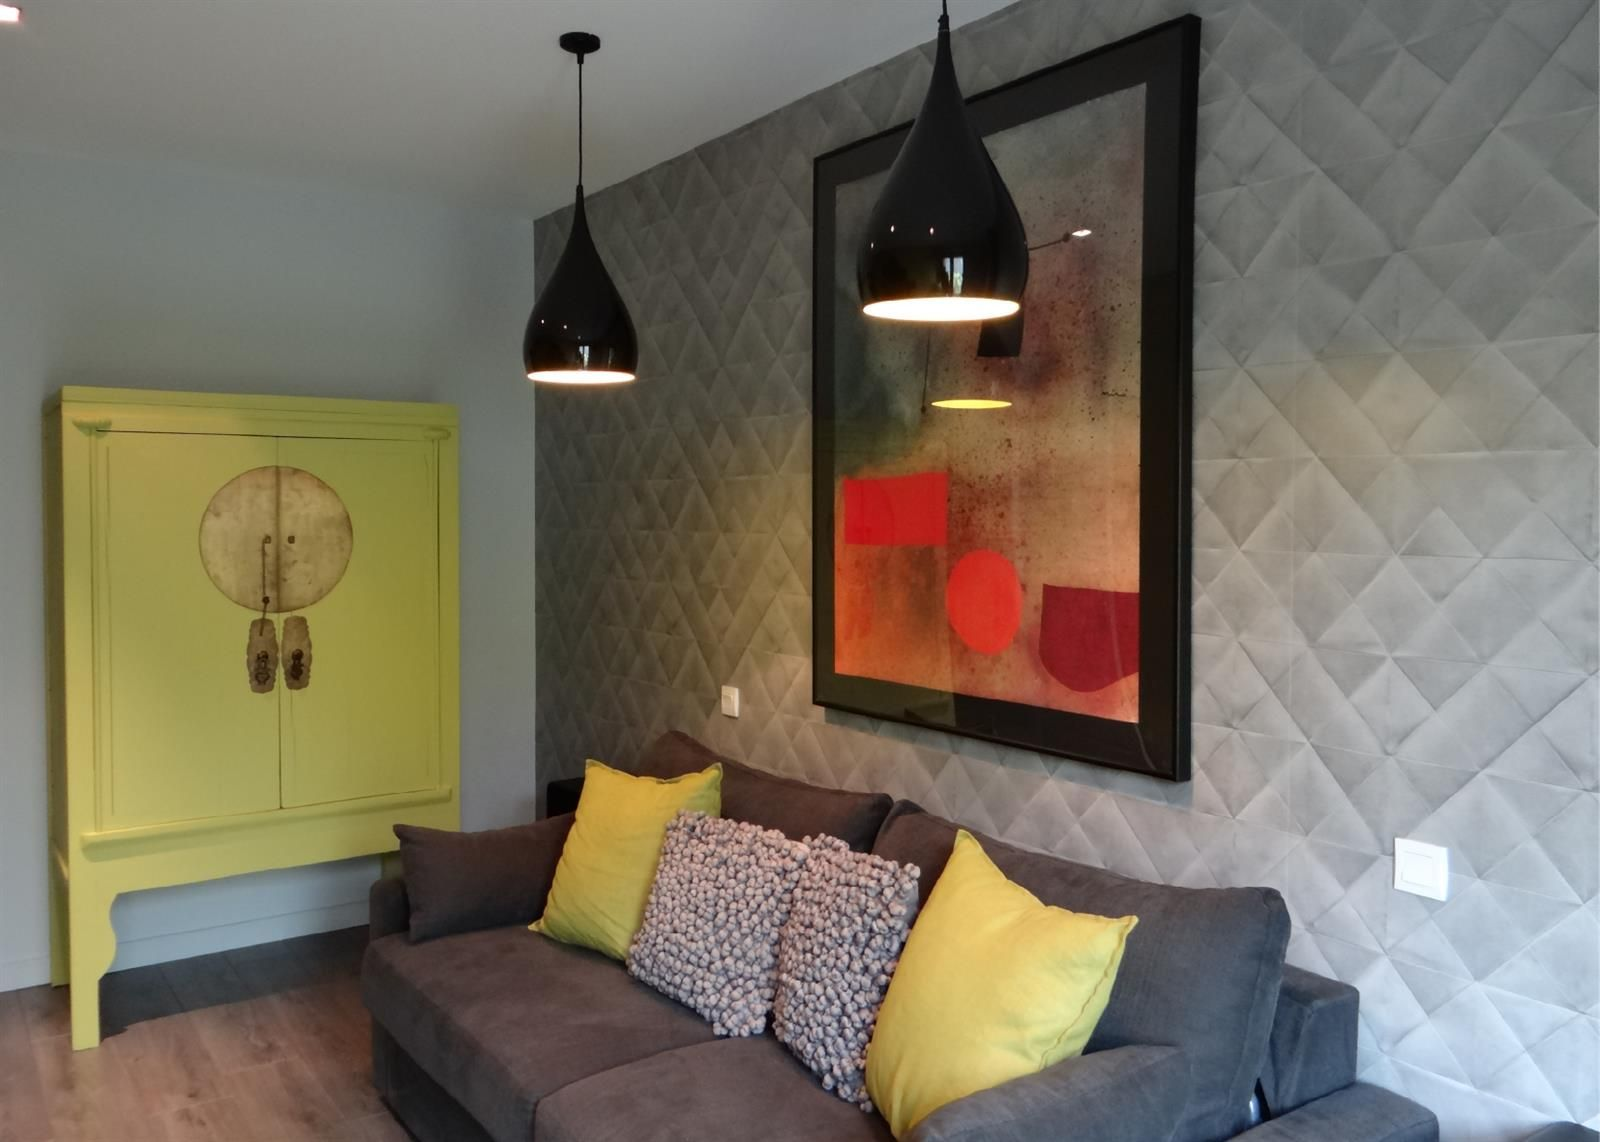 Chambre moderne avec lit BZ. Gris, orange, vert   chambres by jo ...